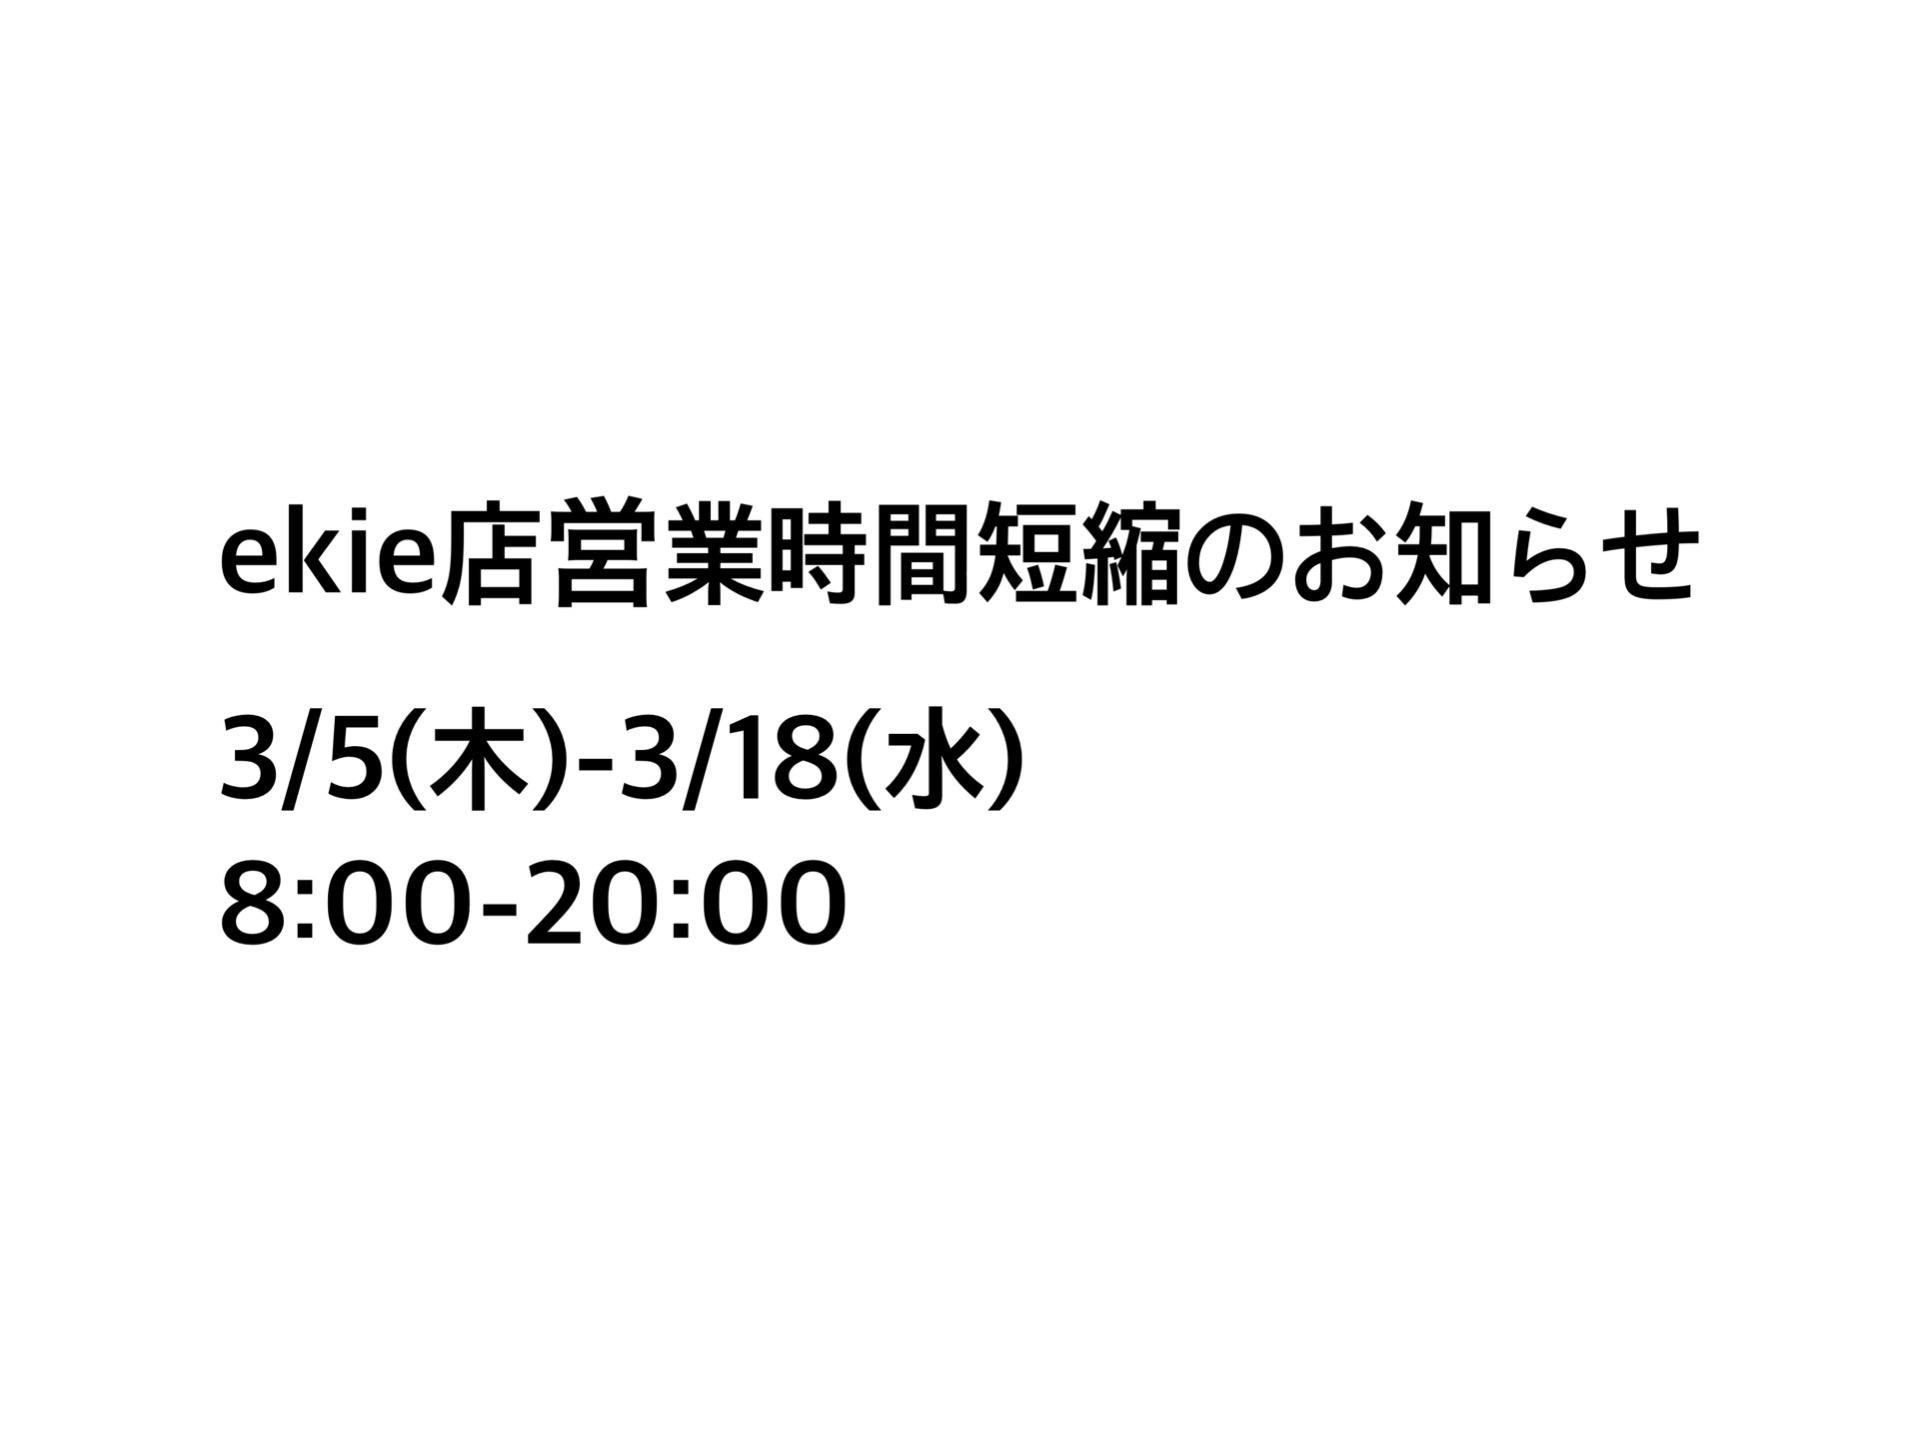 ekie店営業時間短縮のお知らせ3/5(木)〜3/18(水)